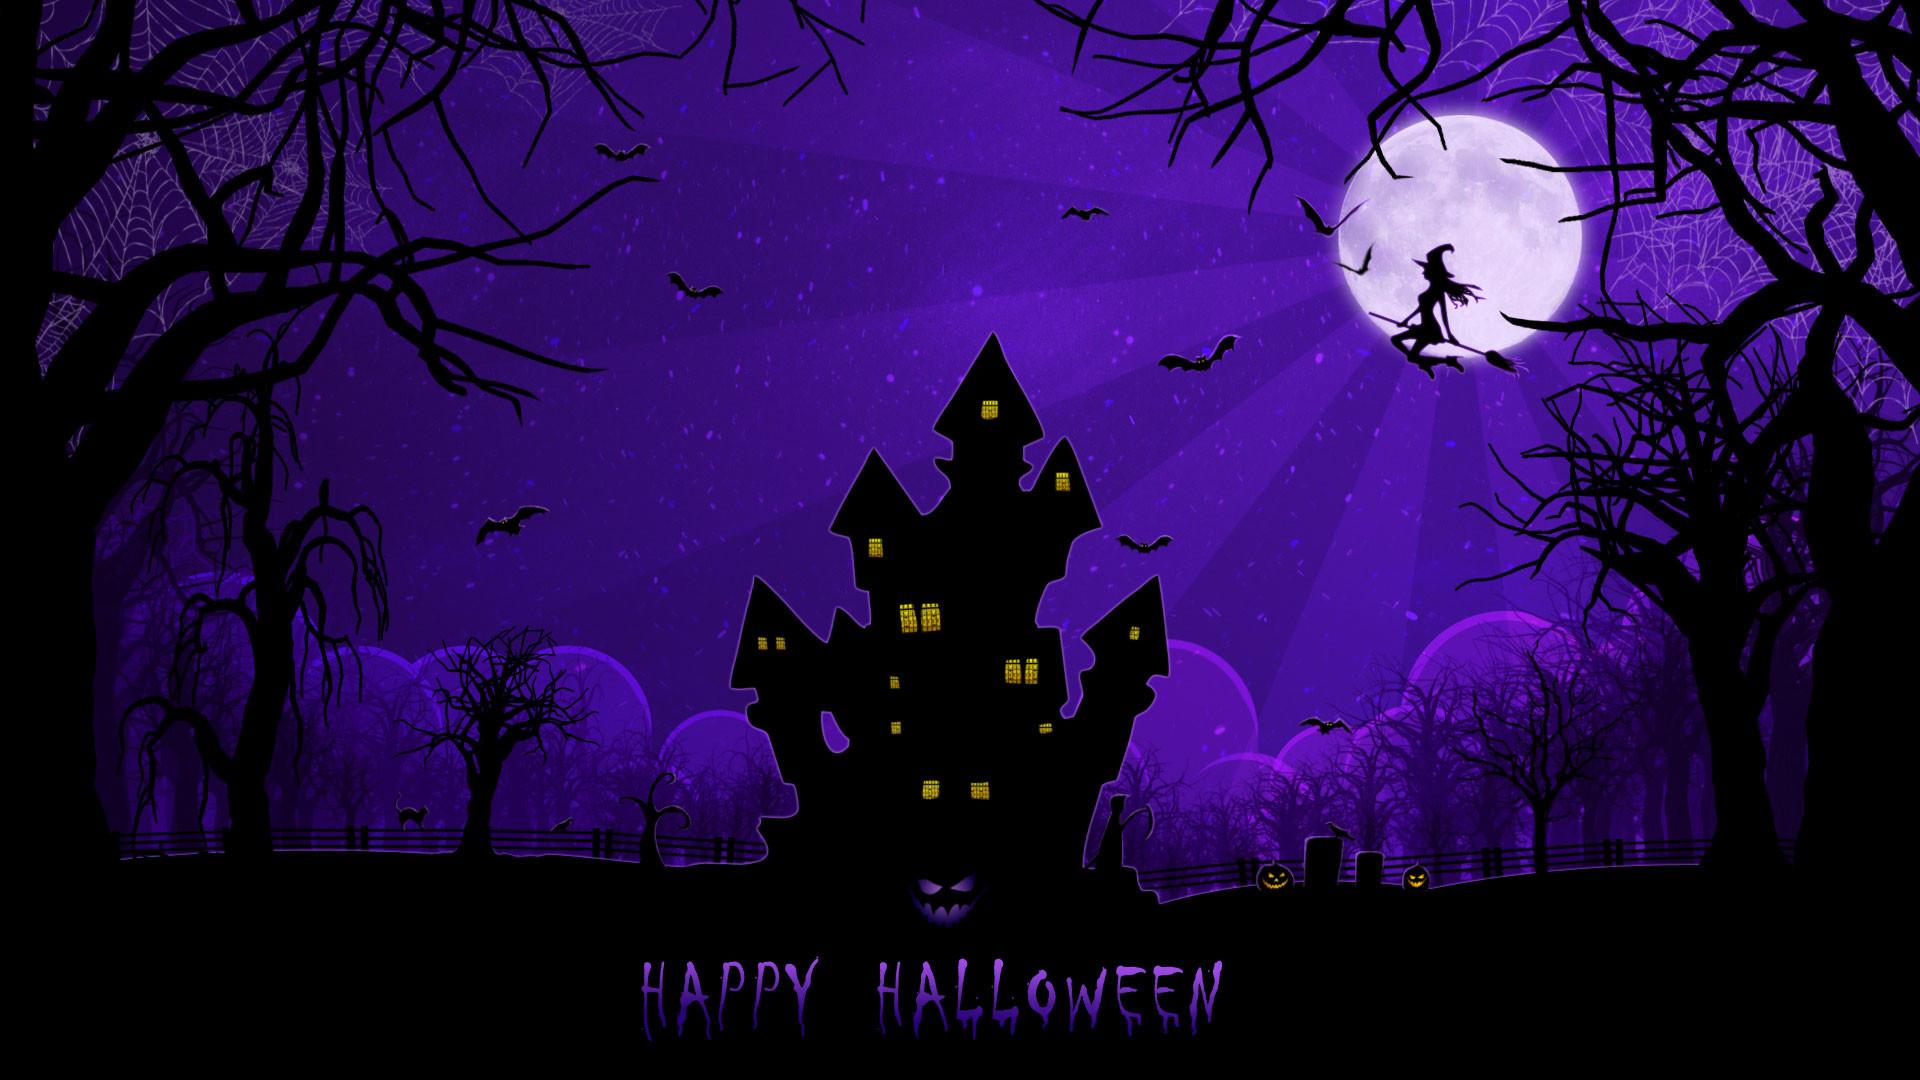 halloween backgrounds wallpaper hd hd wallpapers apple mac wallpapers  artworks 4k best wallpaper ever download pictures